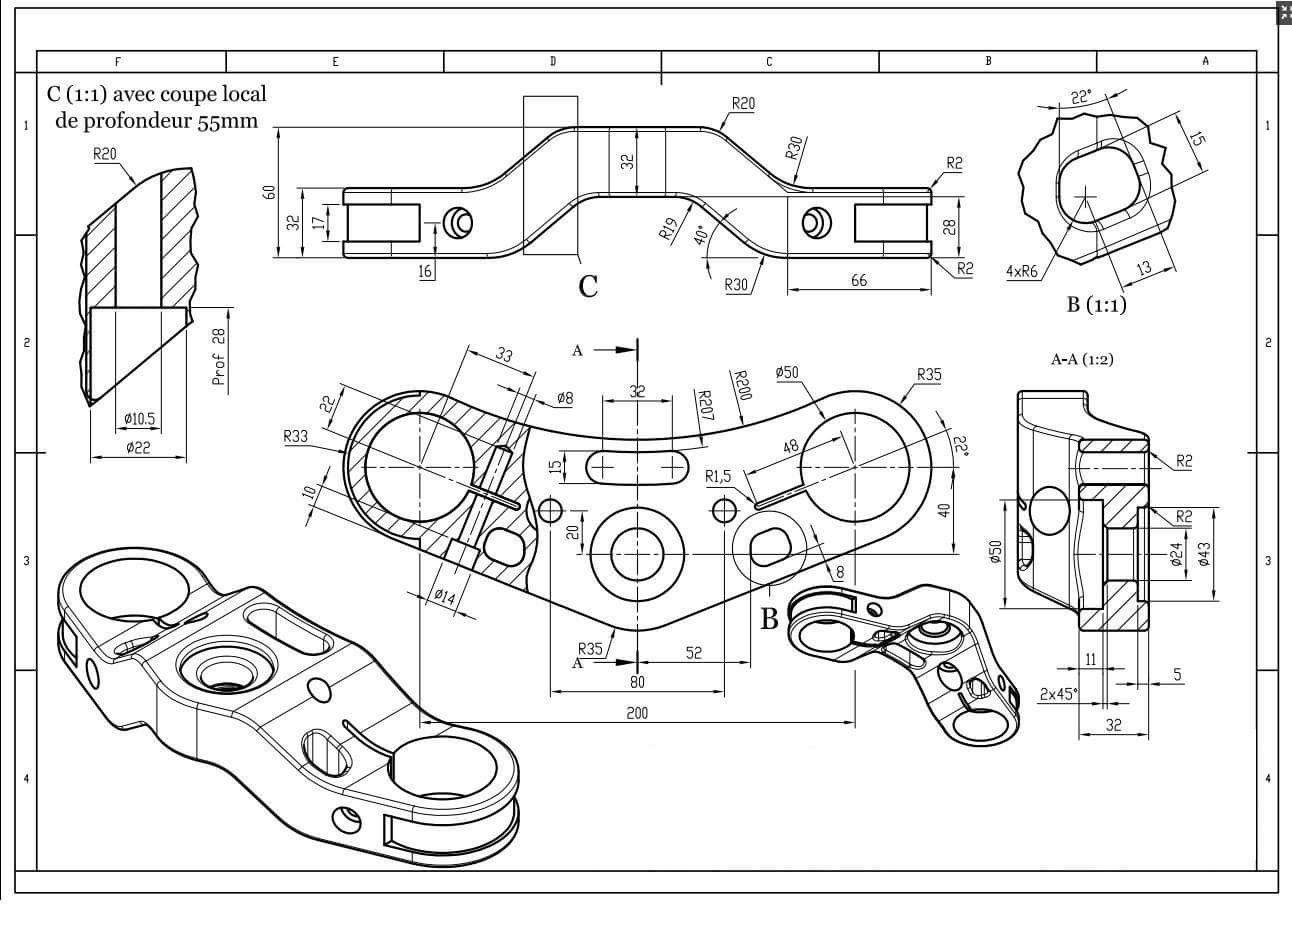 Pin By Chris Kordecki On Aa Industrial Design Sketch Drawing Book Pdf Mechanical Engineering Design